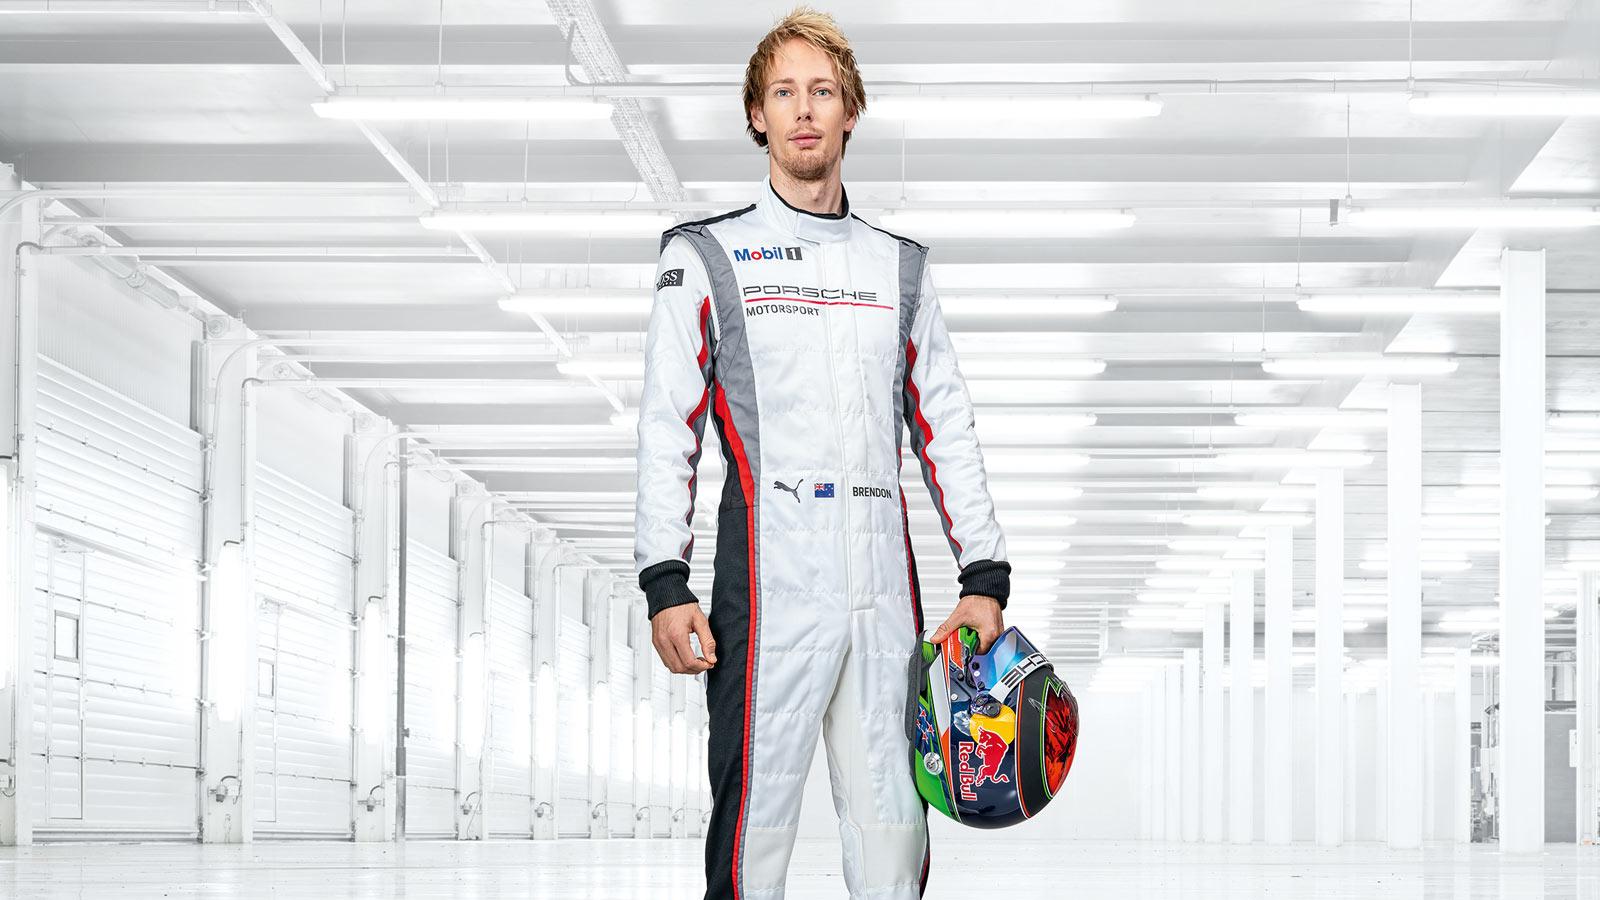 Porsche - Brendon Hartley (test and development driver) NZL